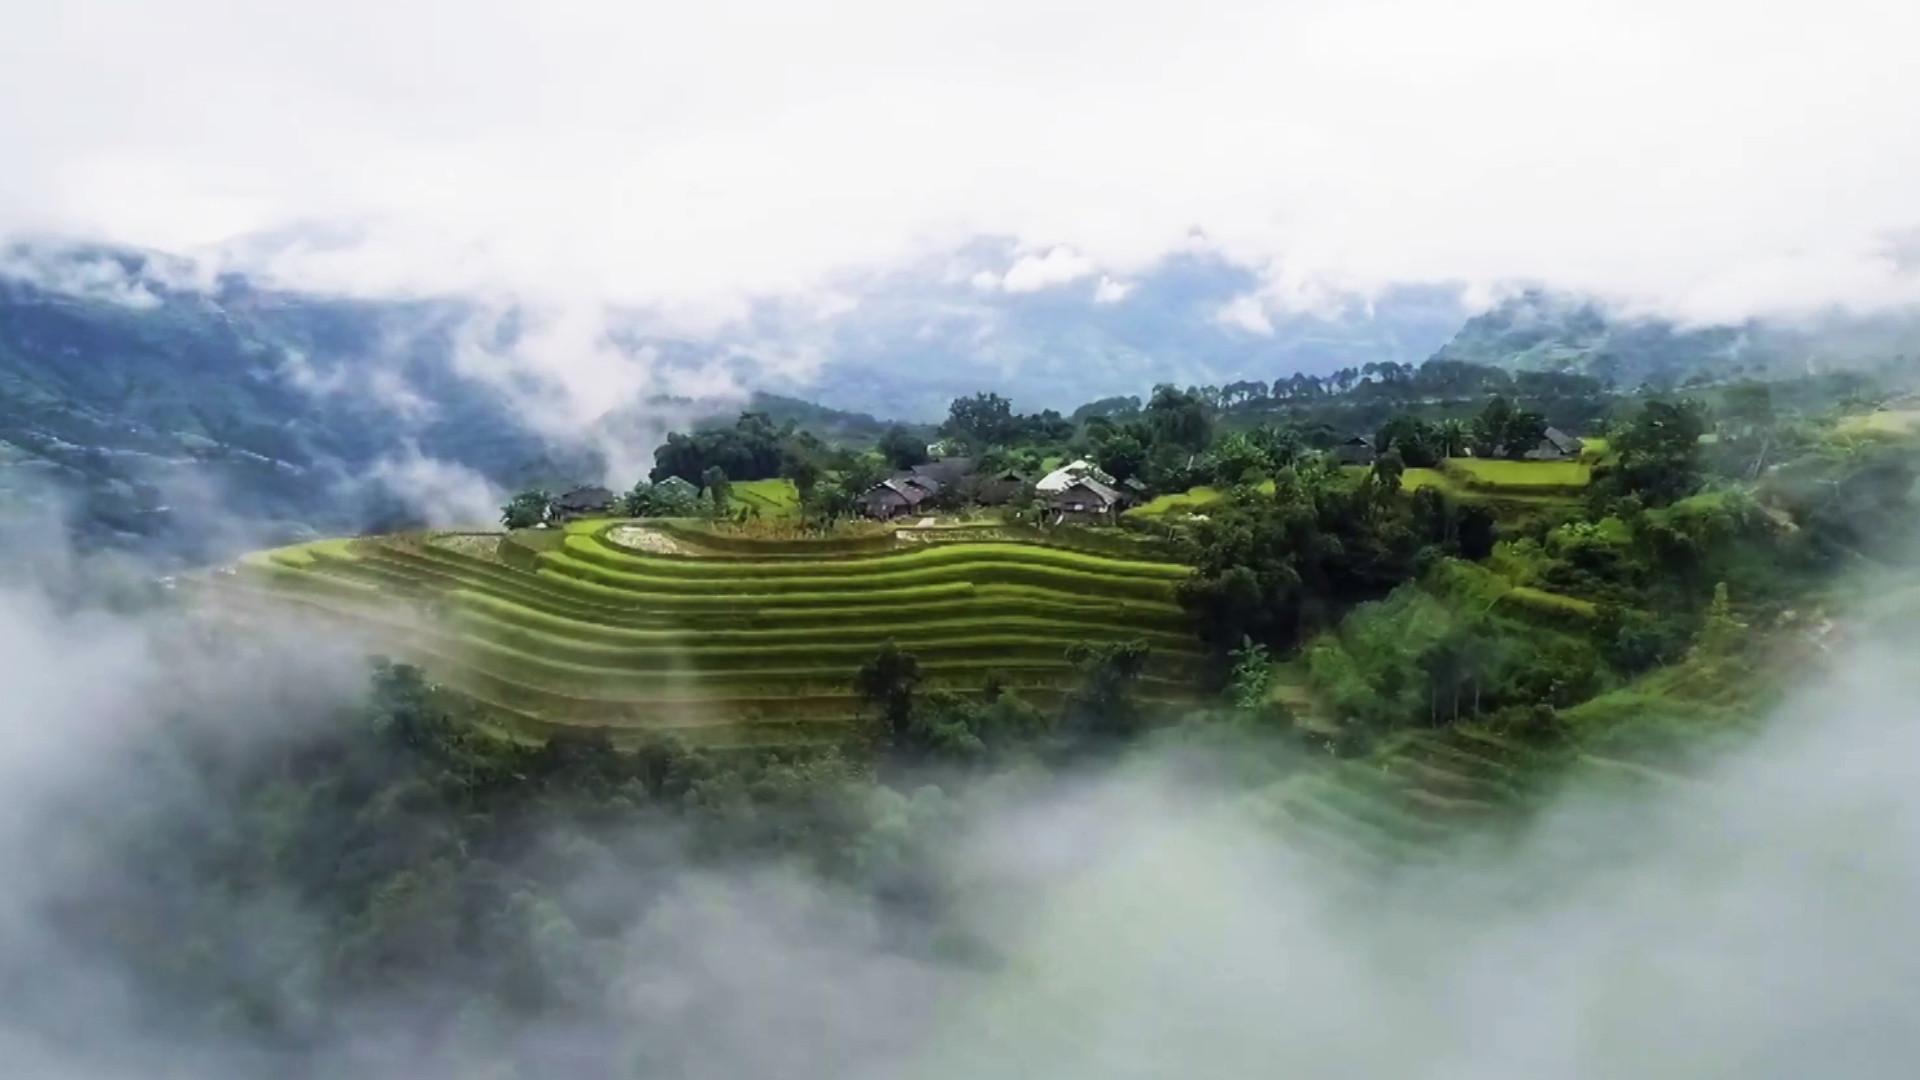 #DiDeYeu, Tourism Promotion Campaign of Vietnam